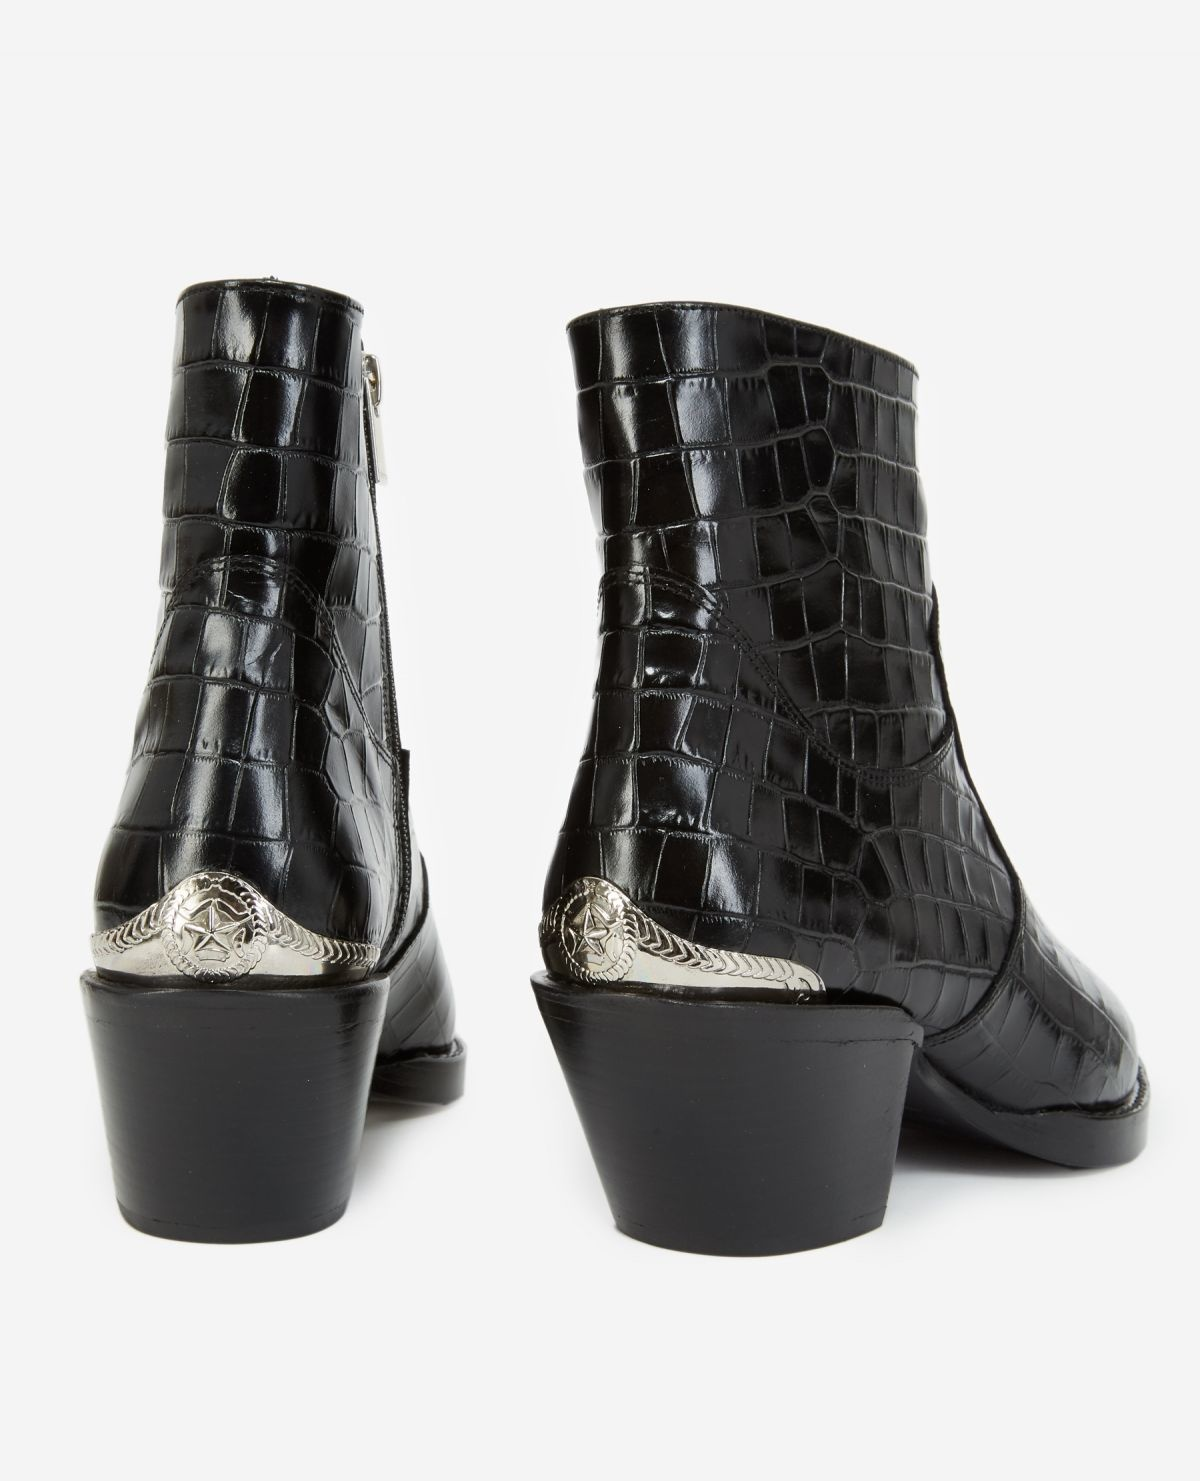 AFCHTHE KOOPLES bottines noires cuir façon croco21055K-7